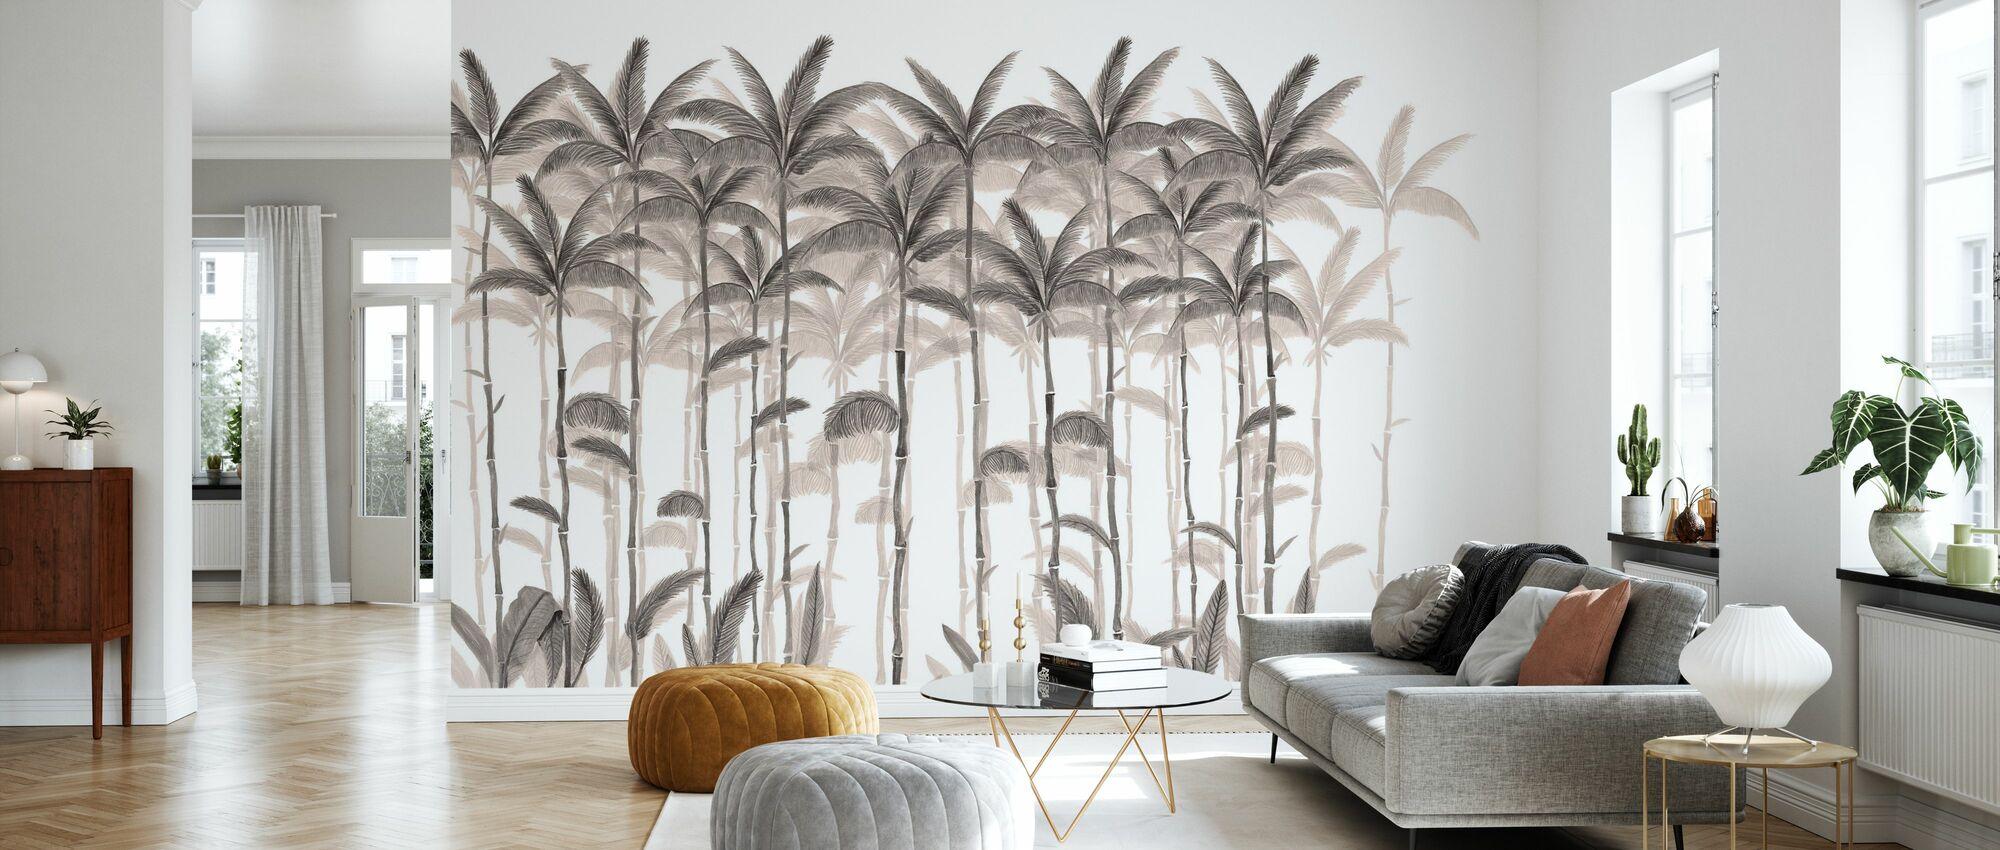 Rijzende palmen - Sepia - Behang - Woonkamer